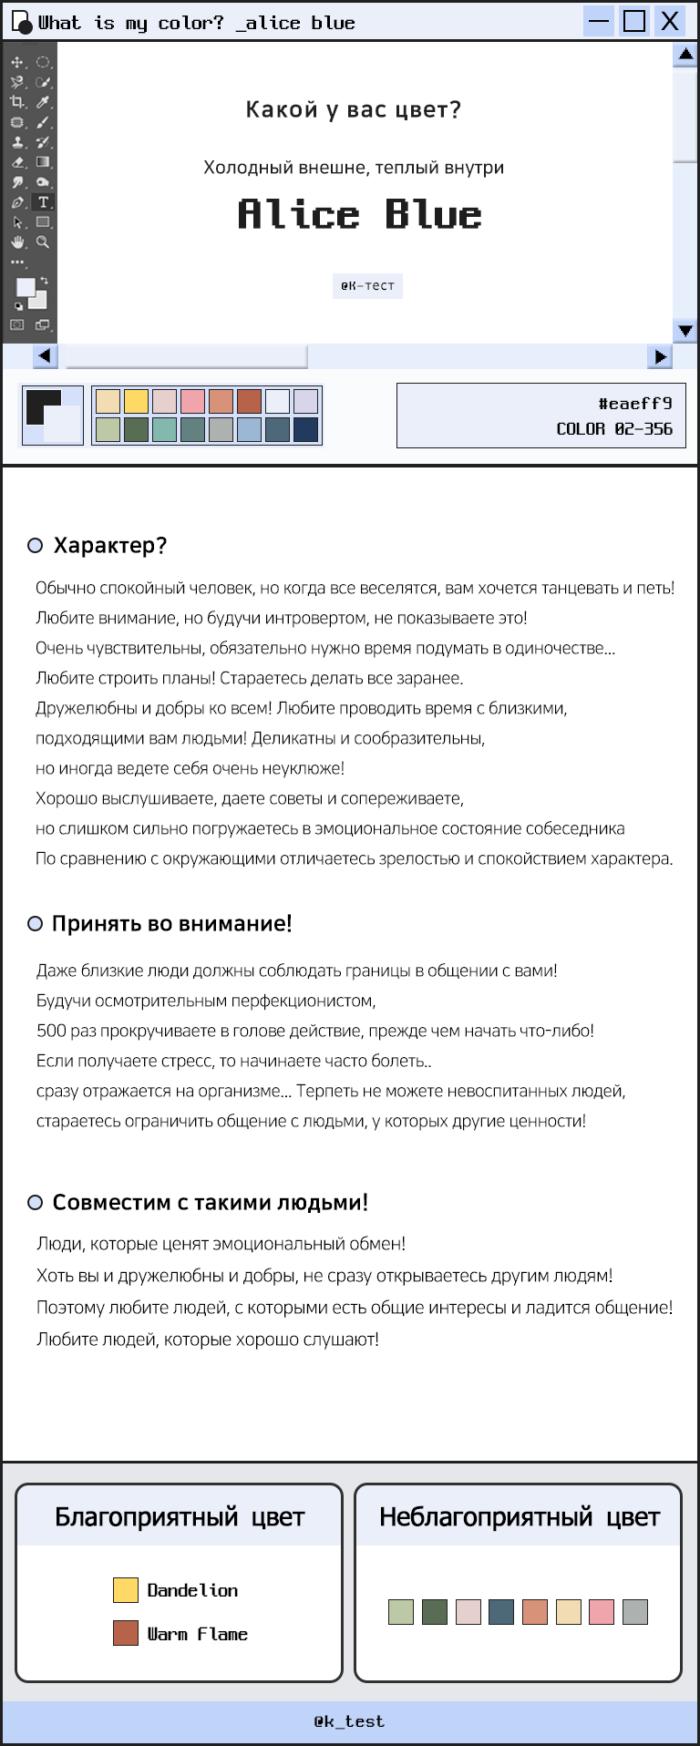 https://ktestone.com/kapable.github.io/personalColorRus/